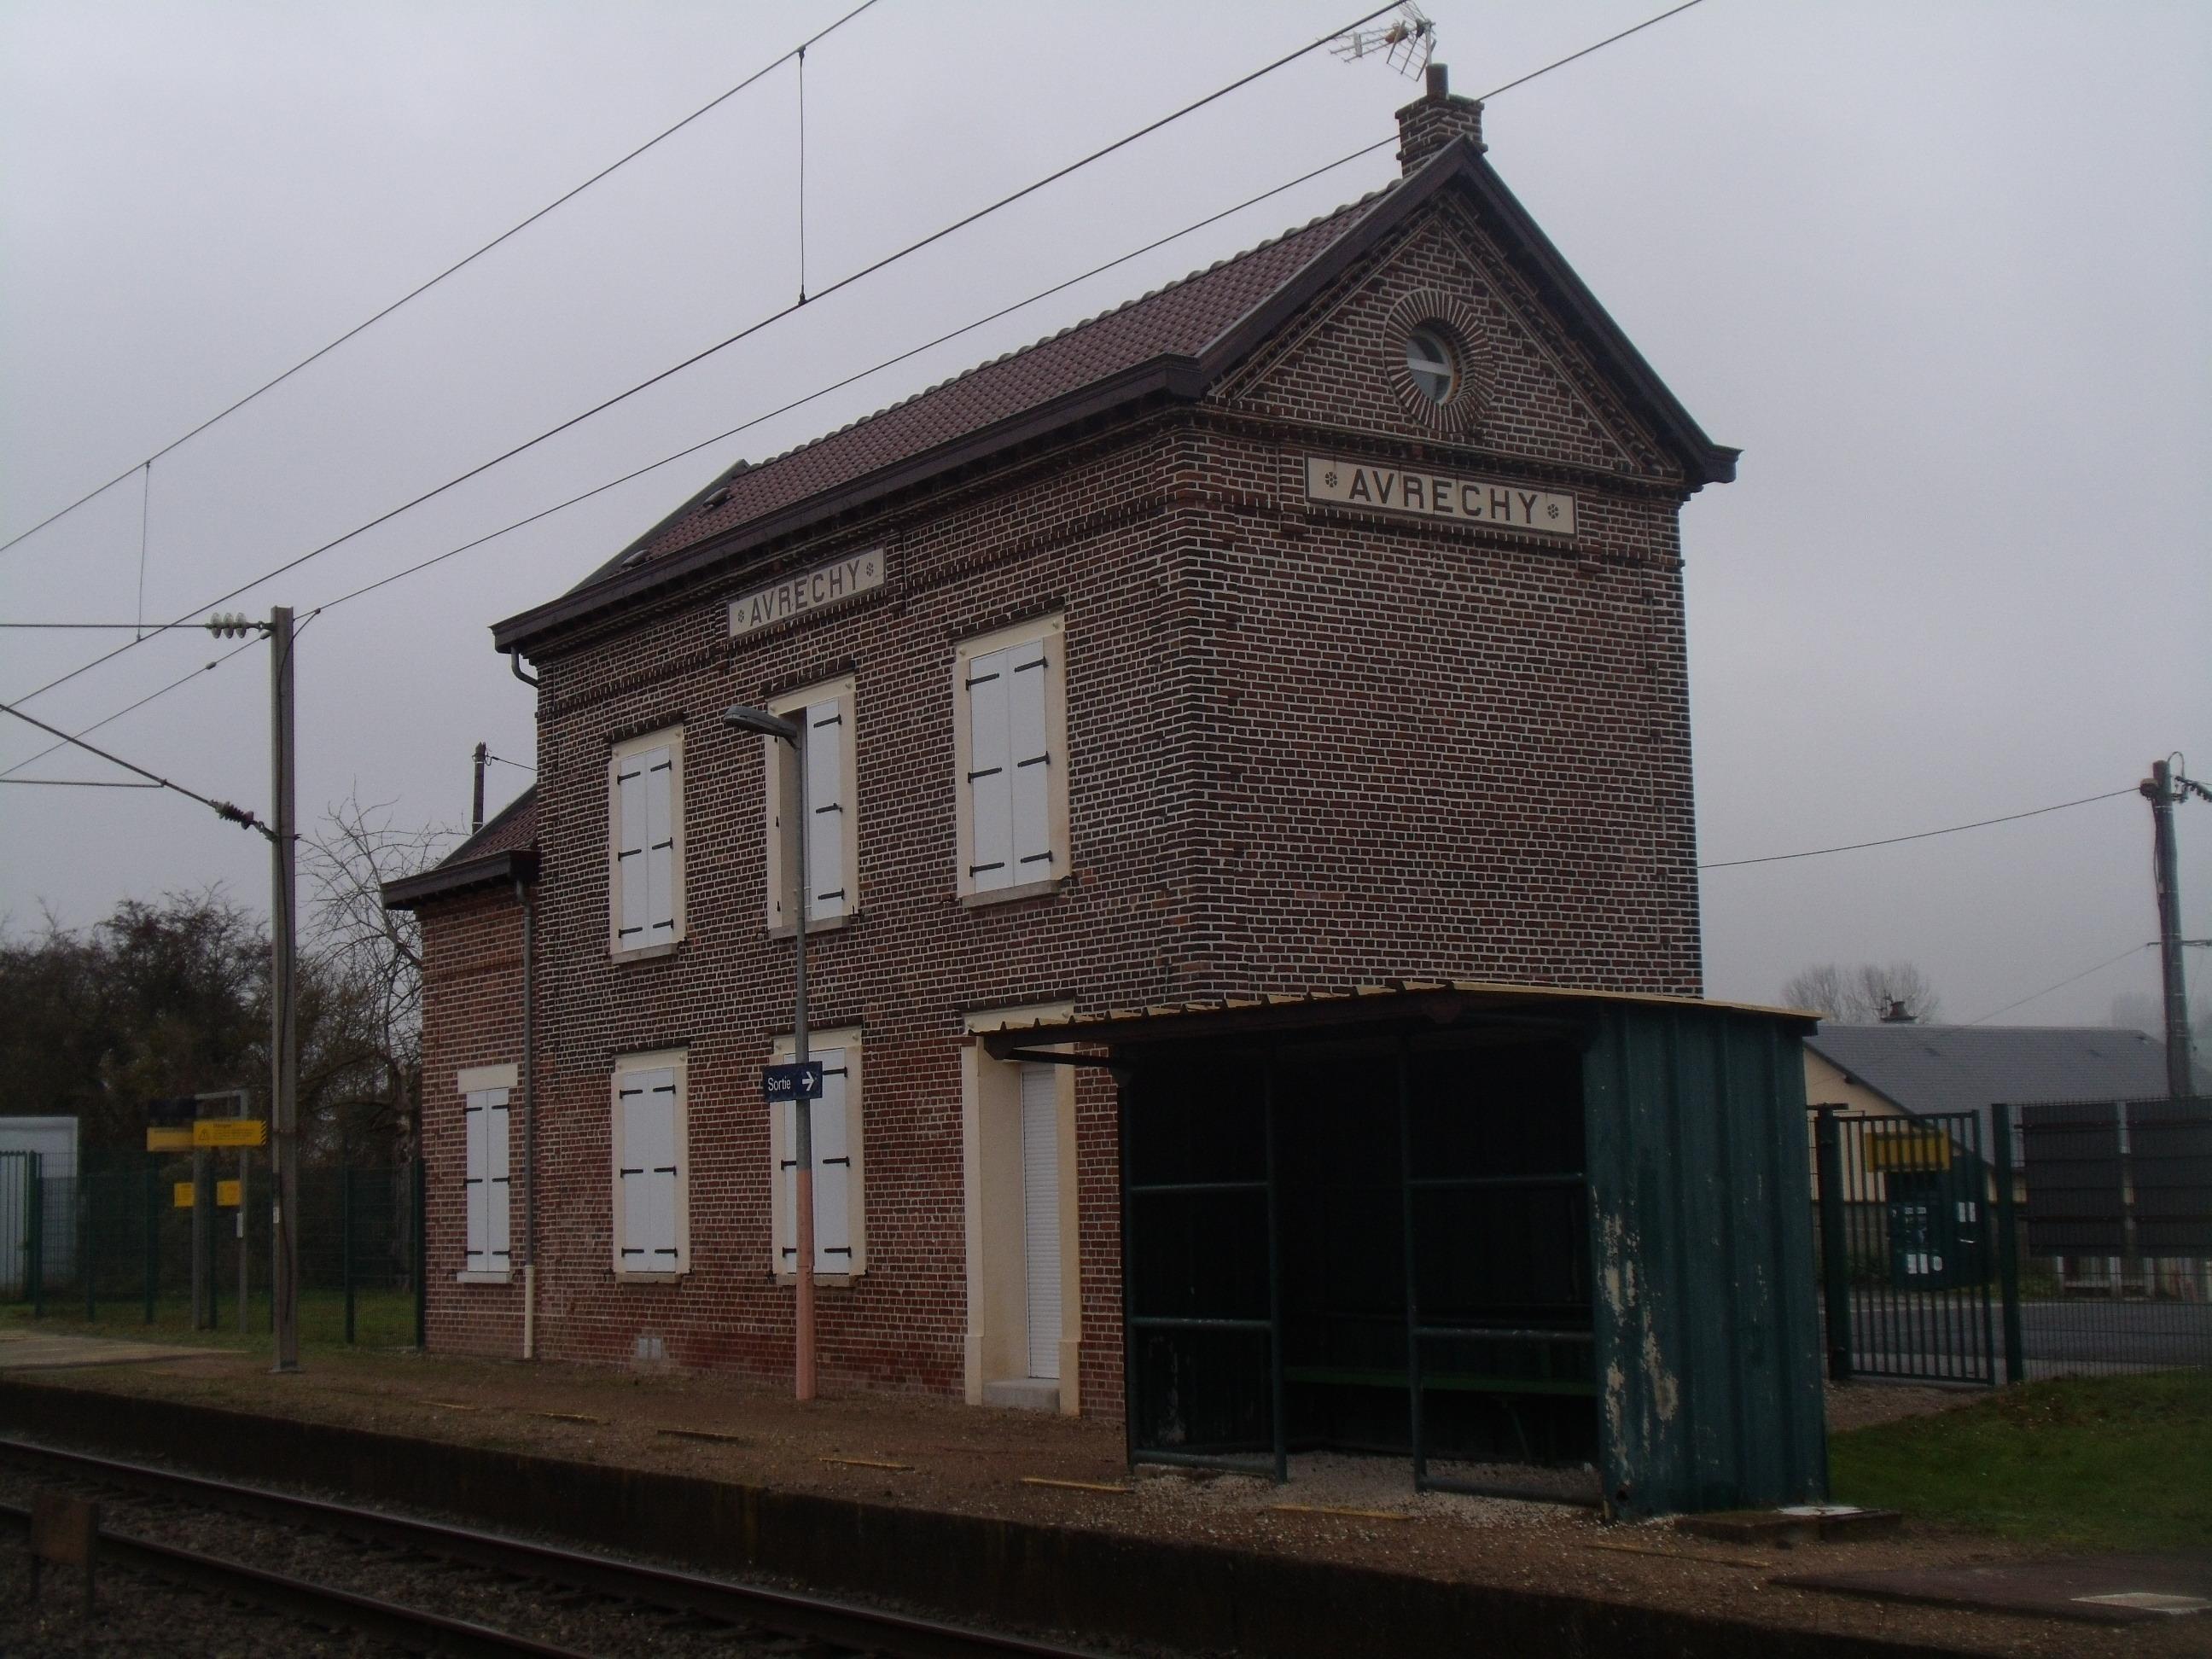 Station Avrechy